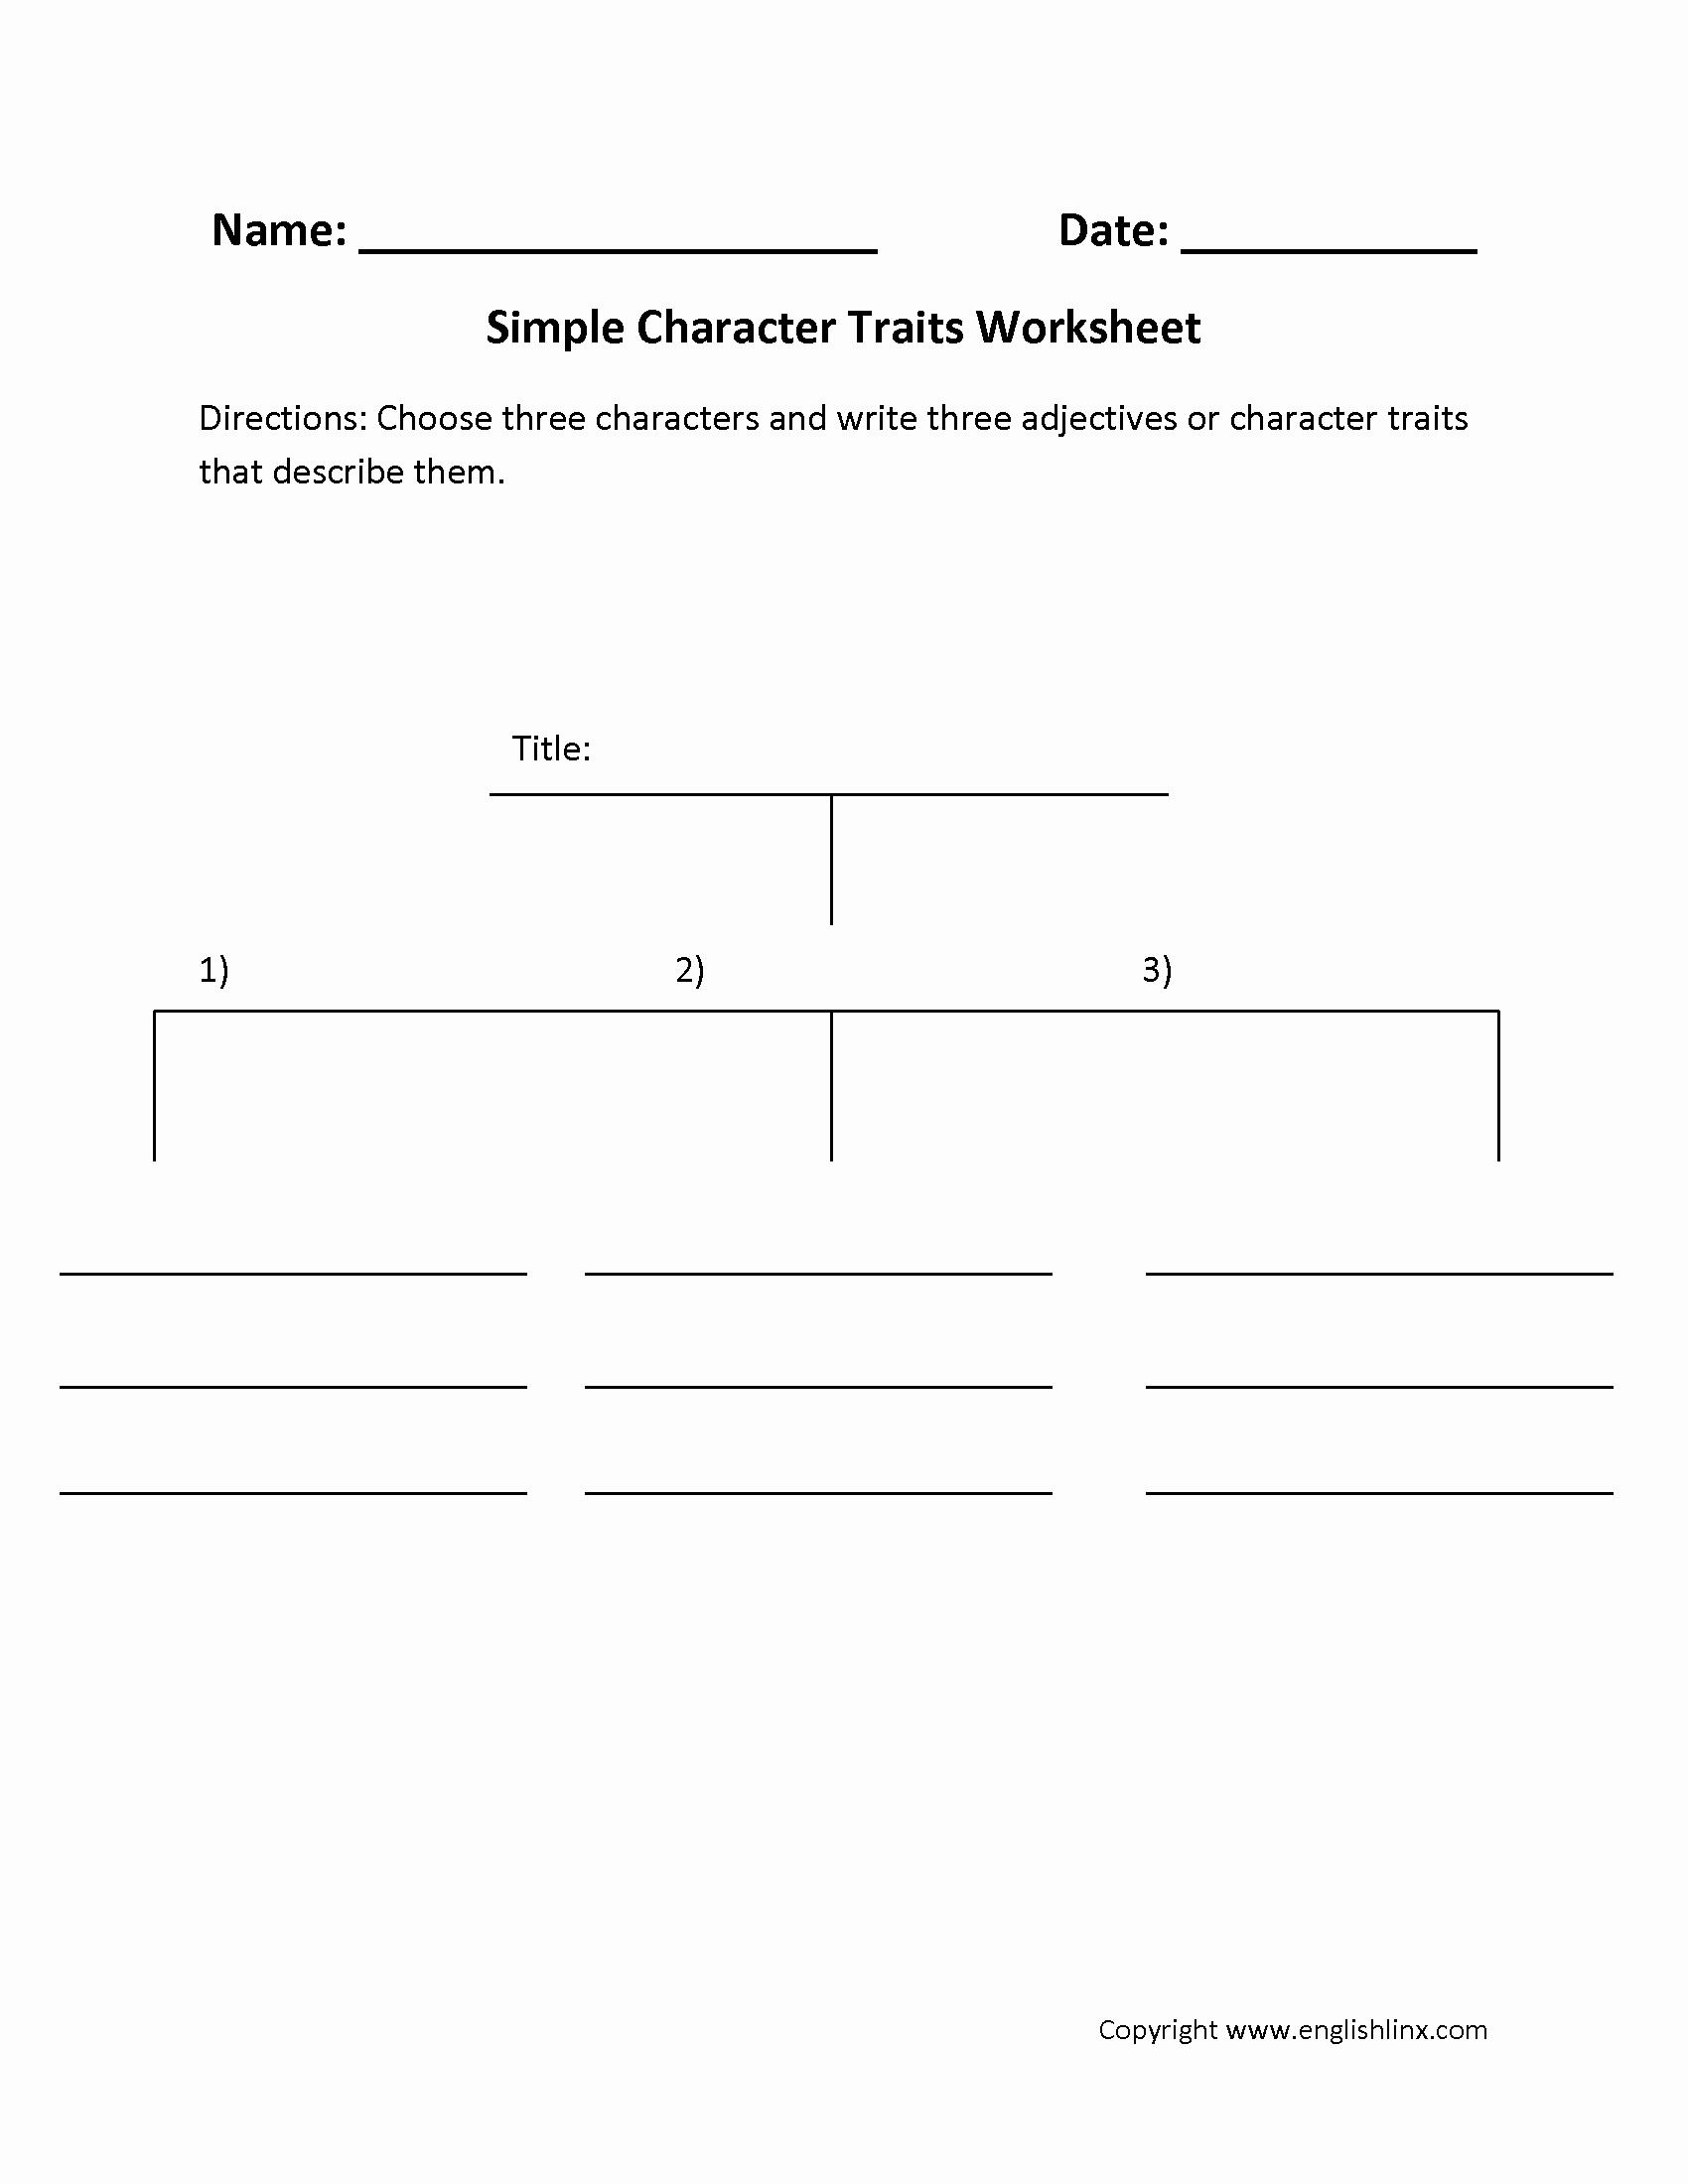 Identifying Character Traits Worksheet Elegant Worksheet Identifying Character Traits Worksheet